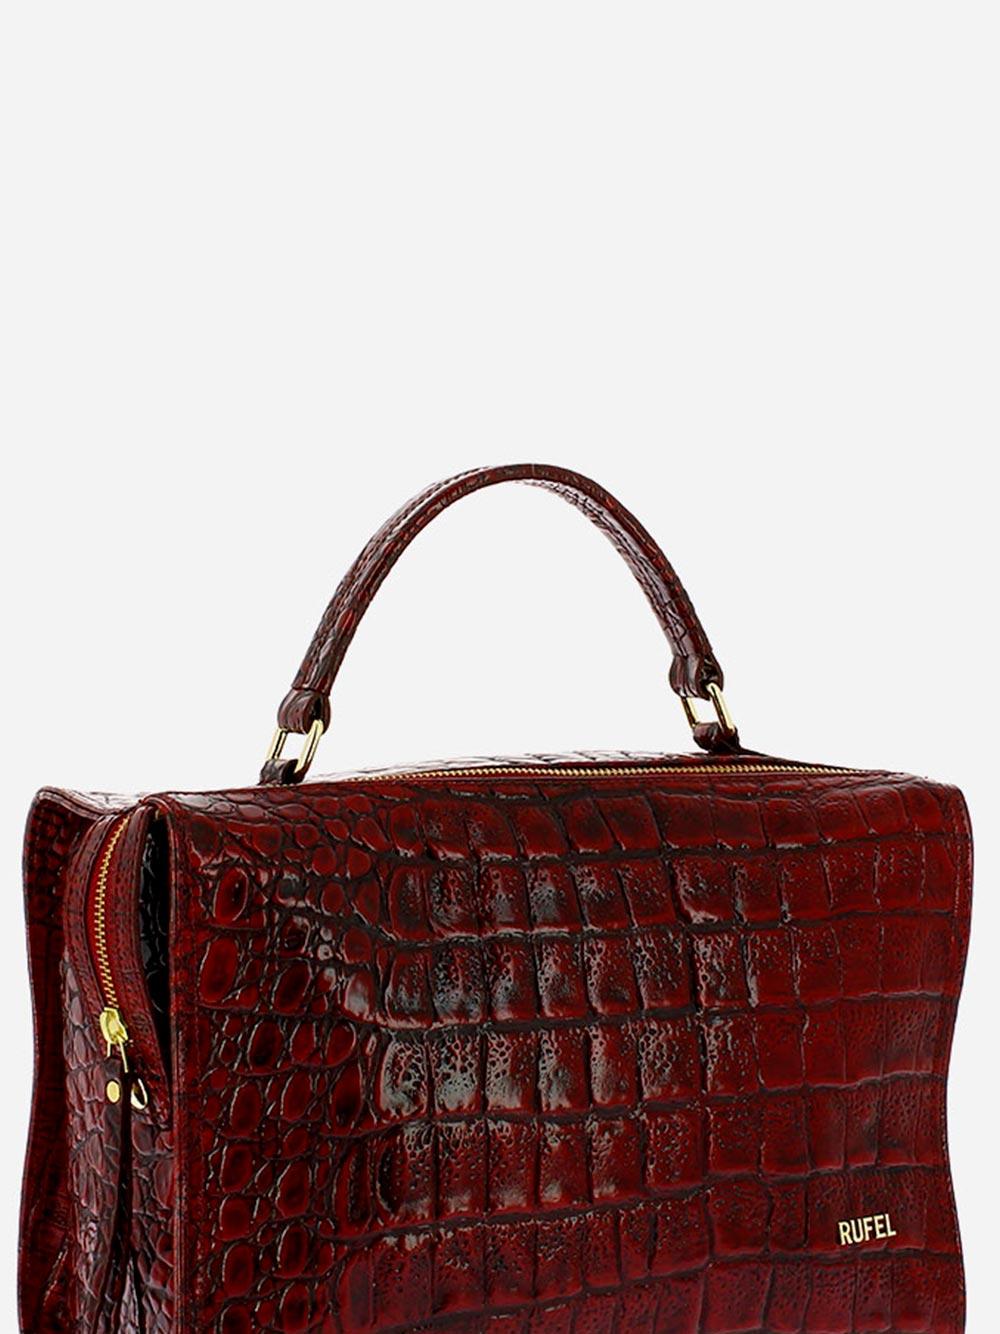 Croco Wild Burgundy Handbag